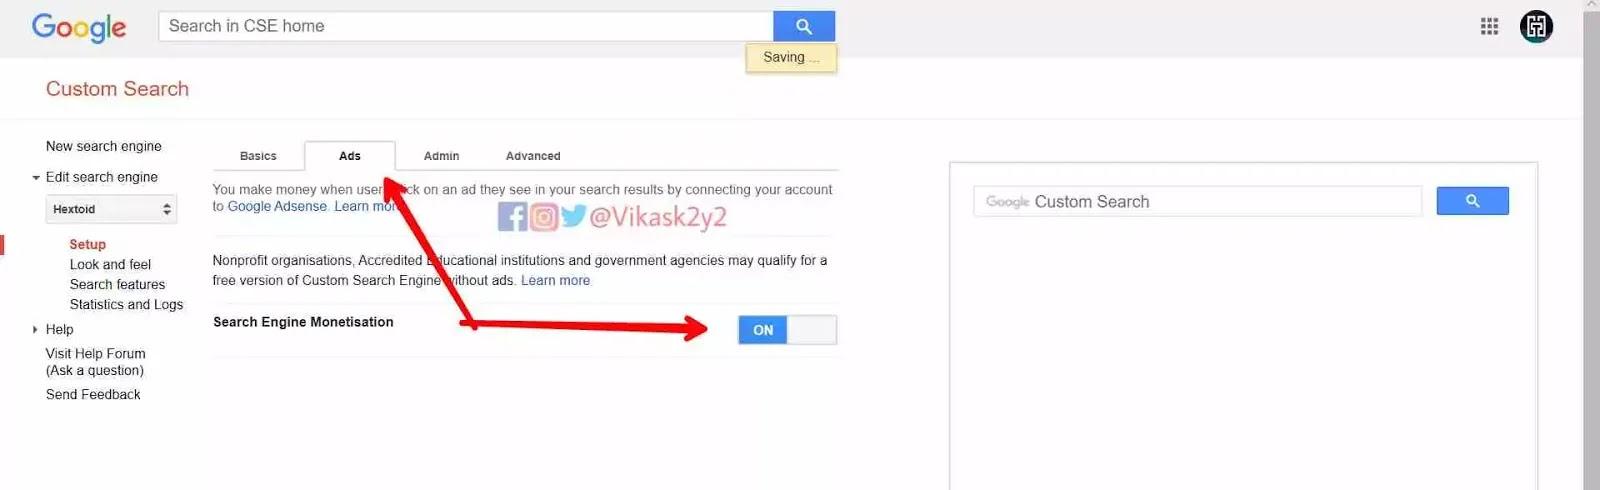 Turn On Search Engine Monetization